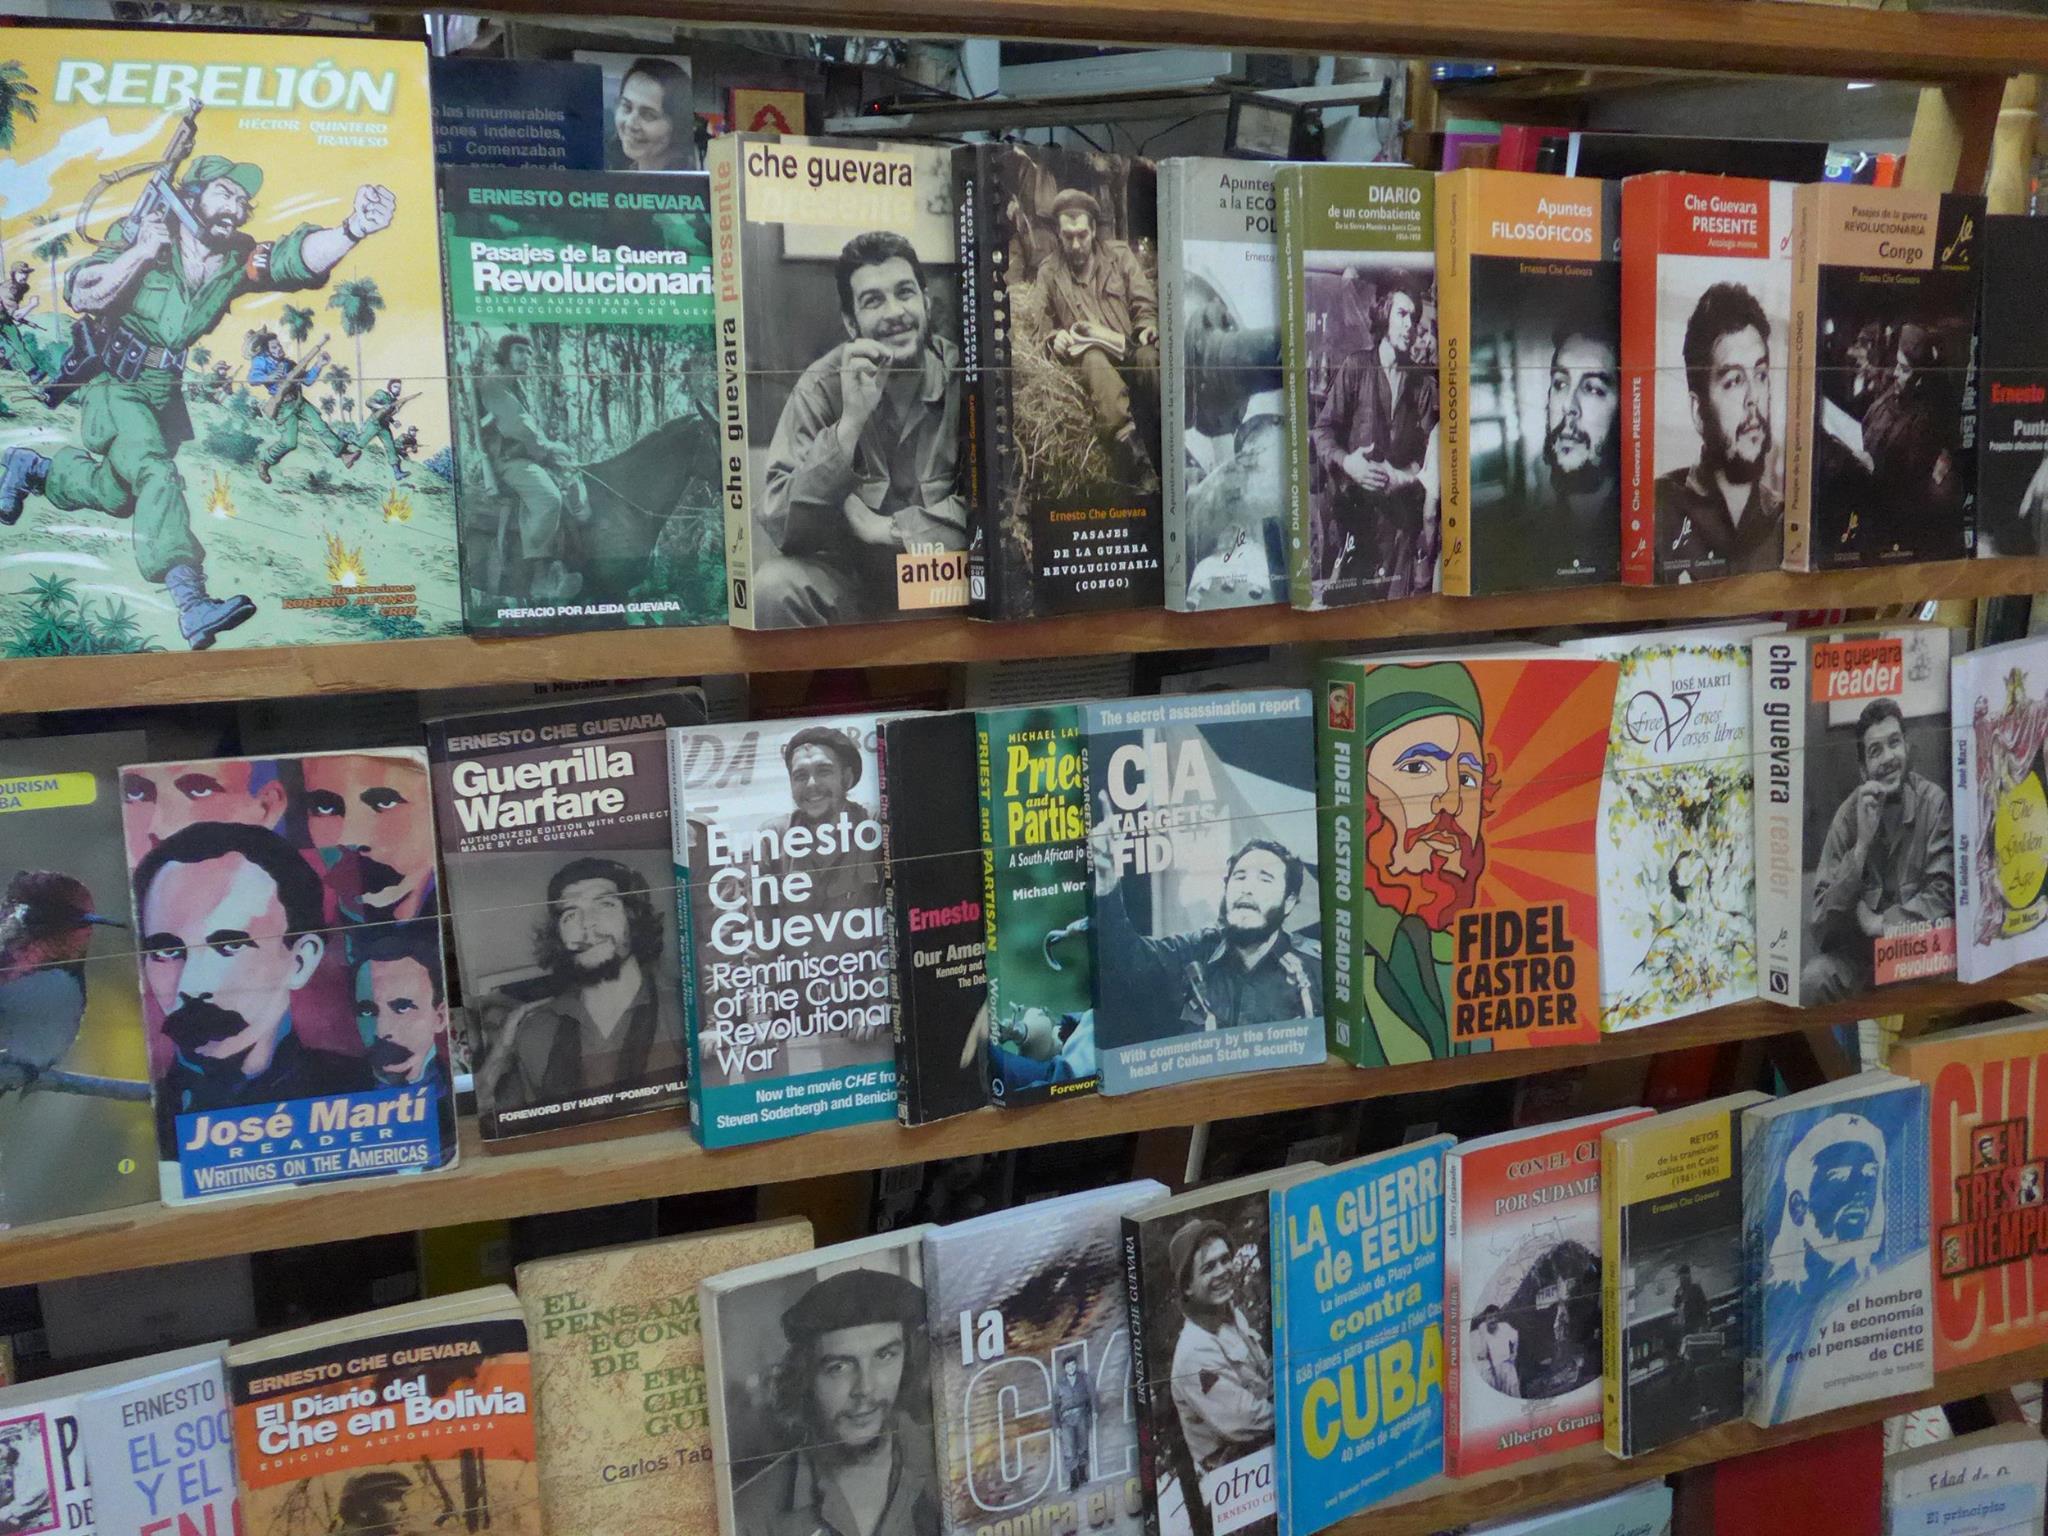 De boekwinkeltjes in Cuba zitten vol met Che en Fidel-propaganda.